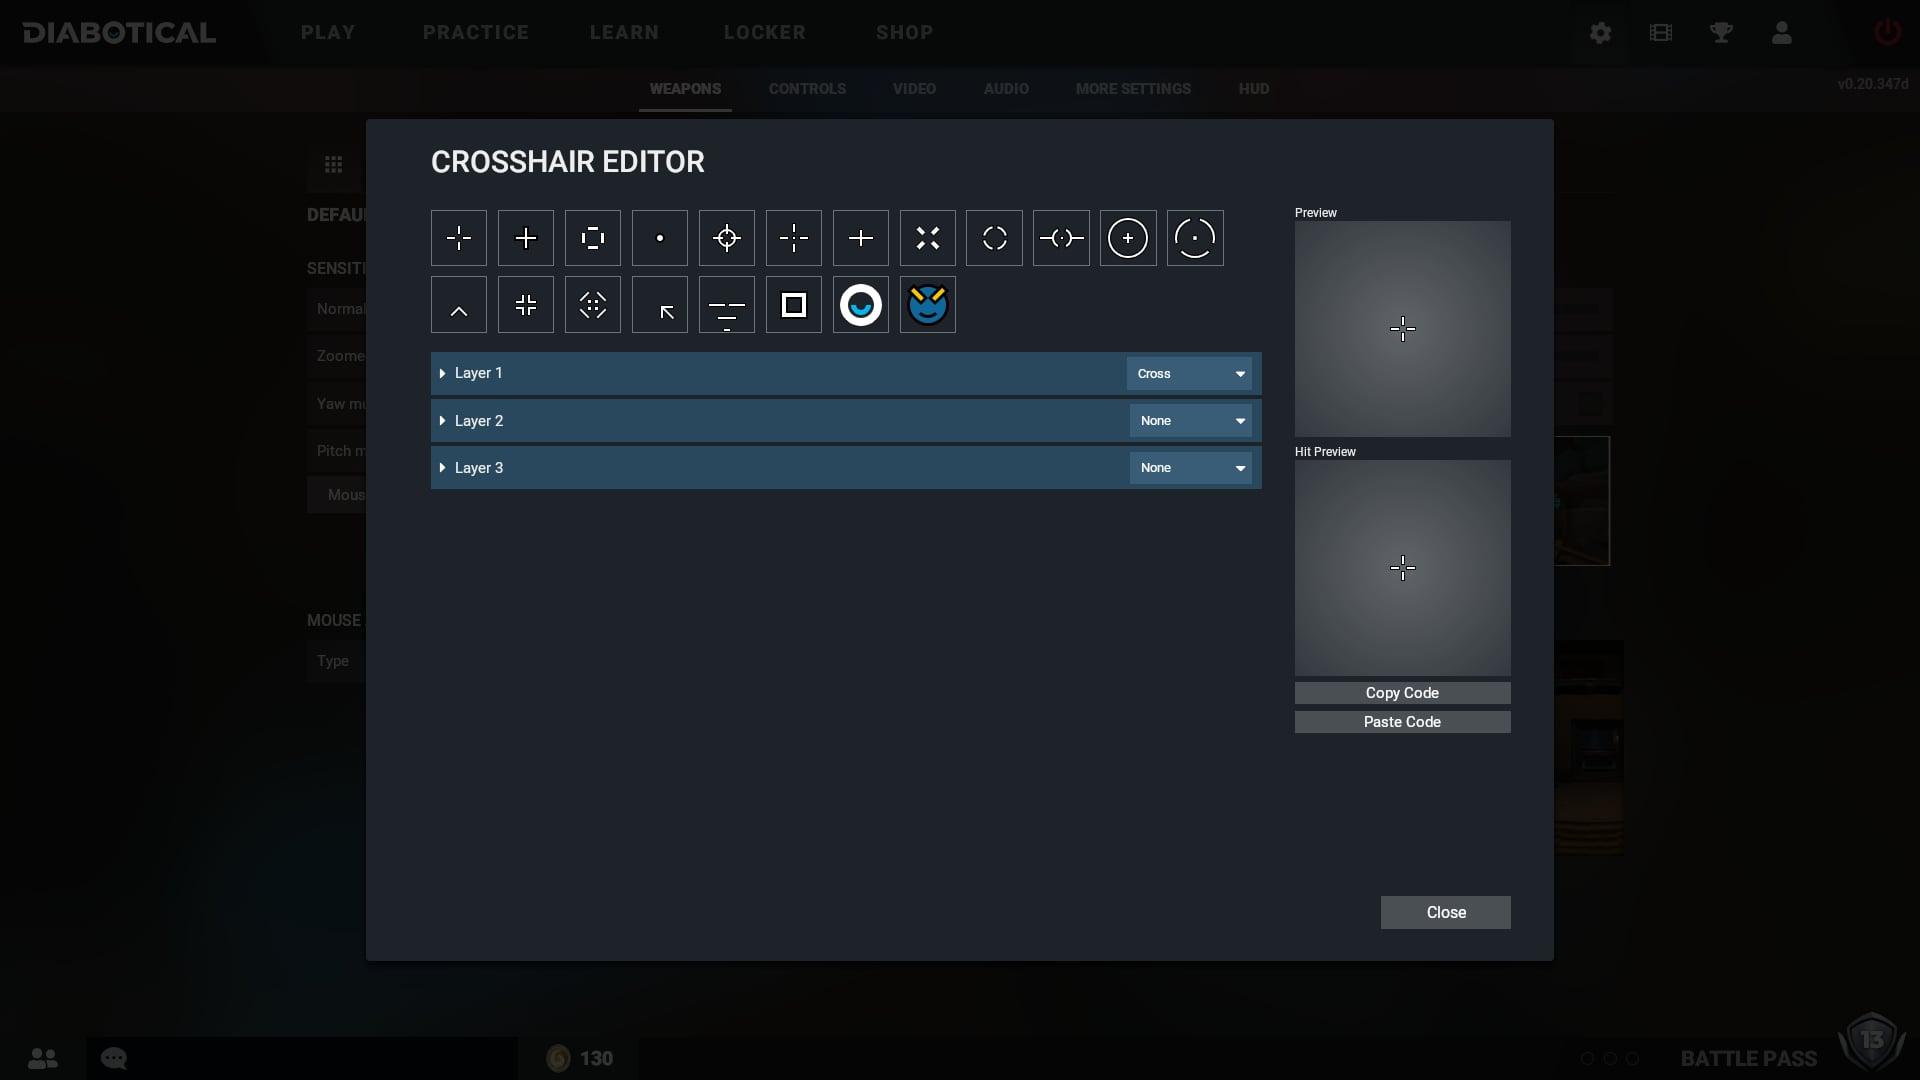 Diabotical Crosshair Editor UI